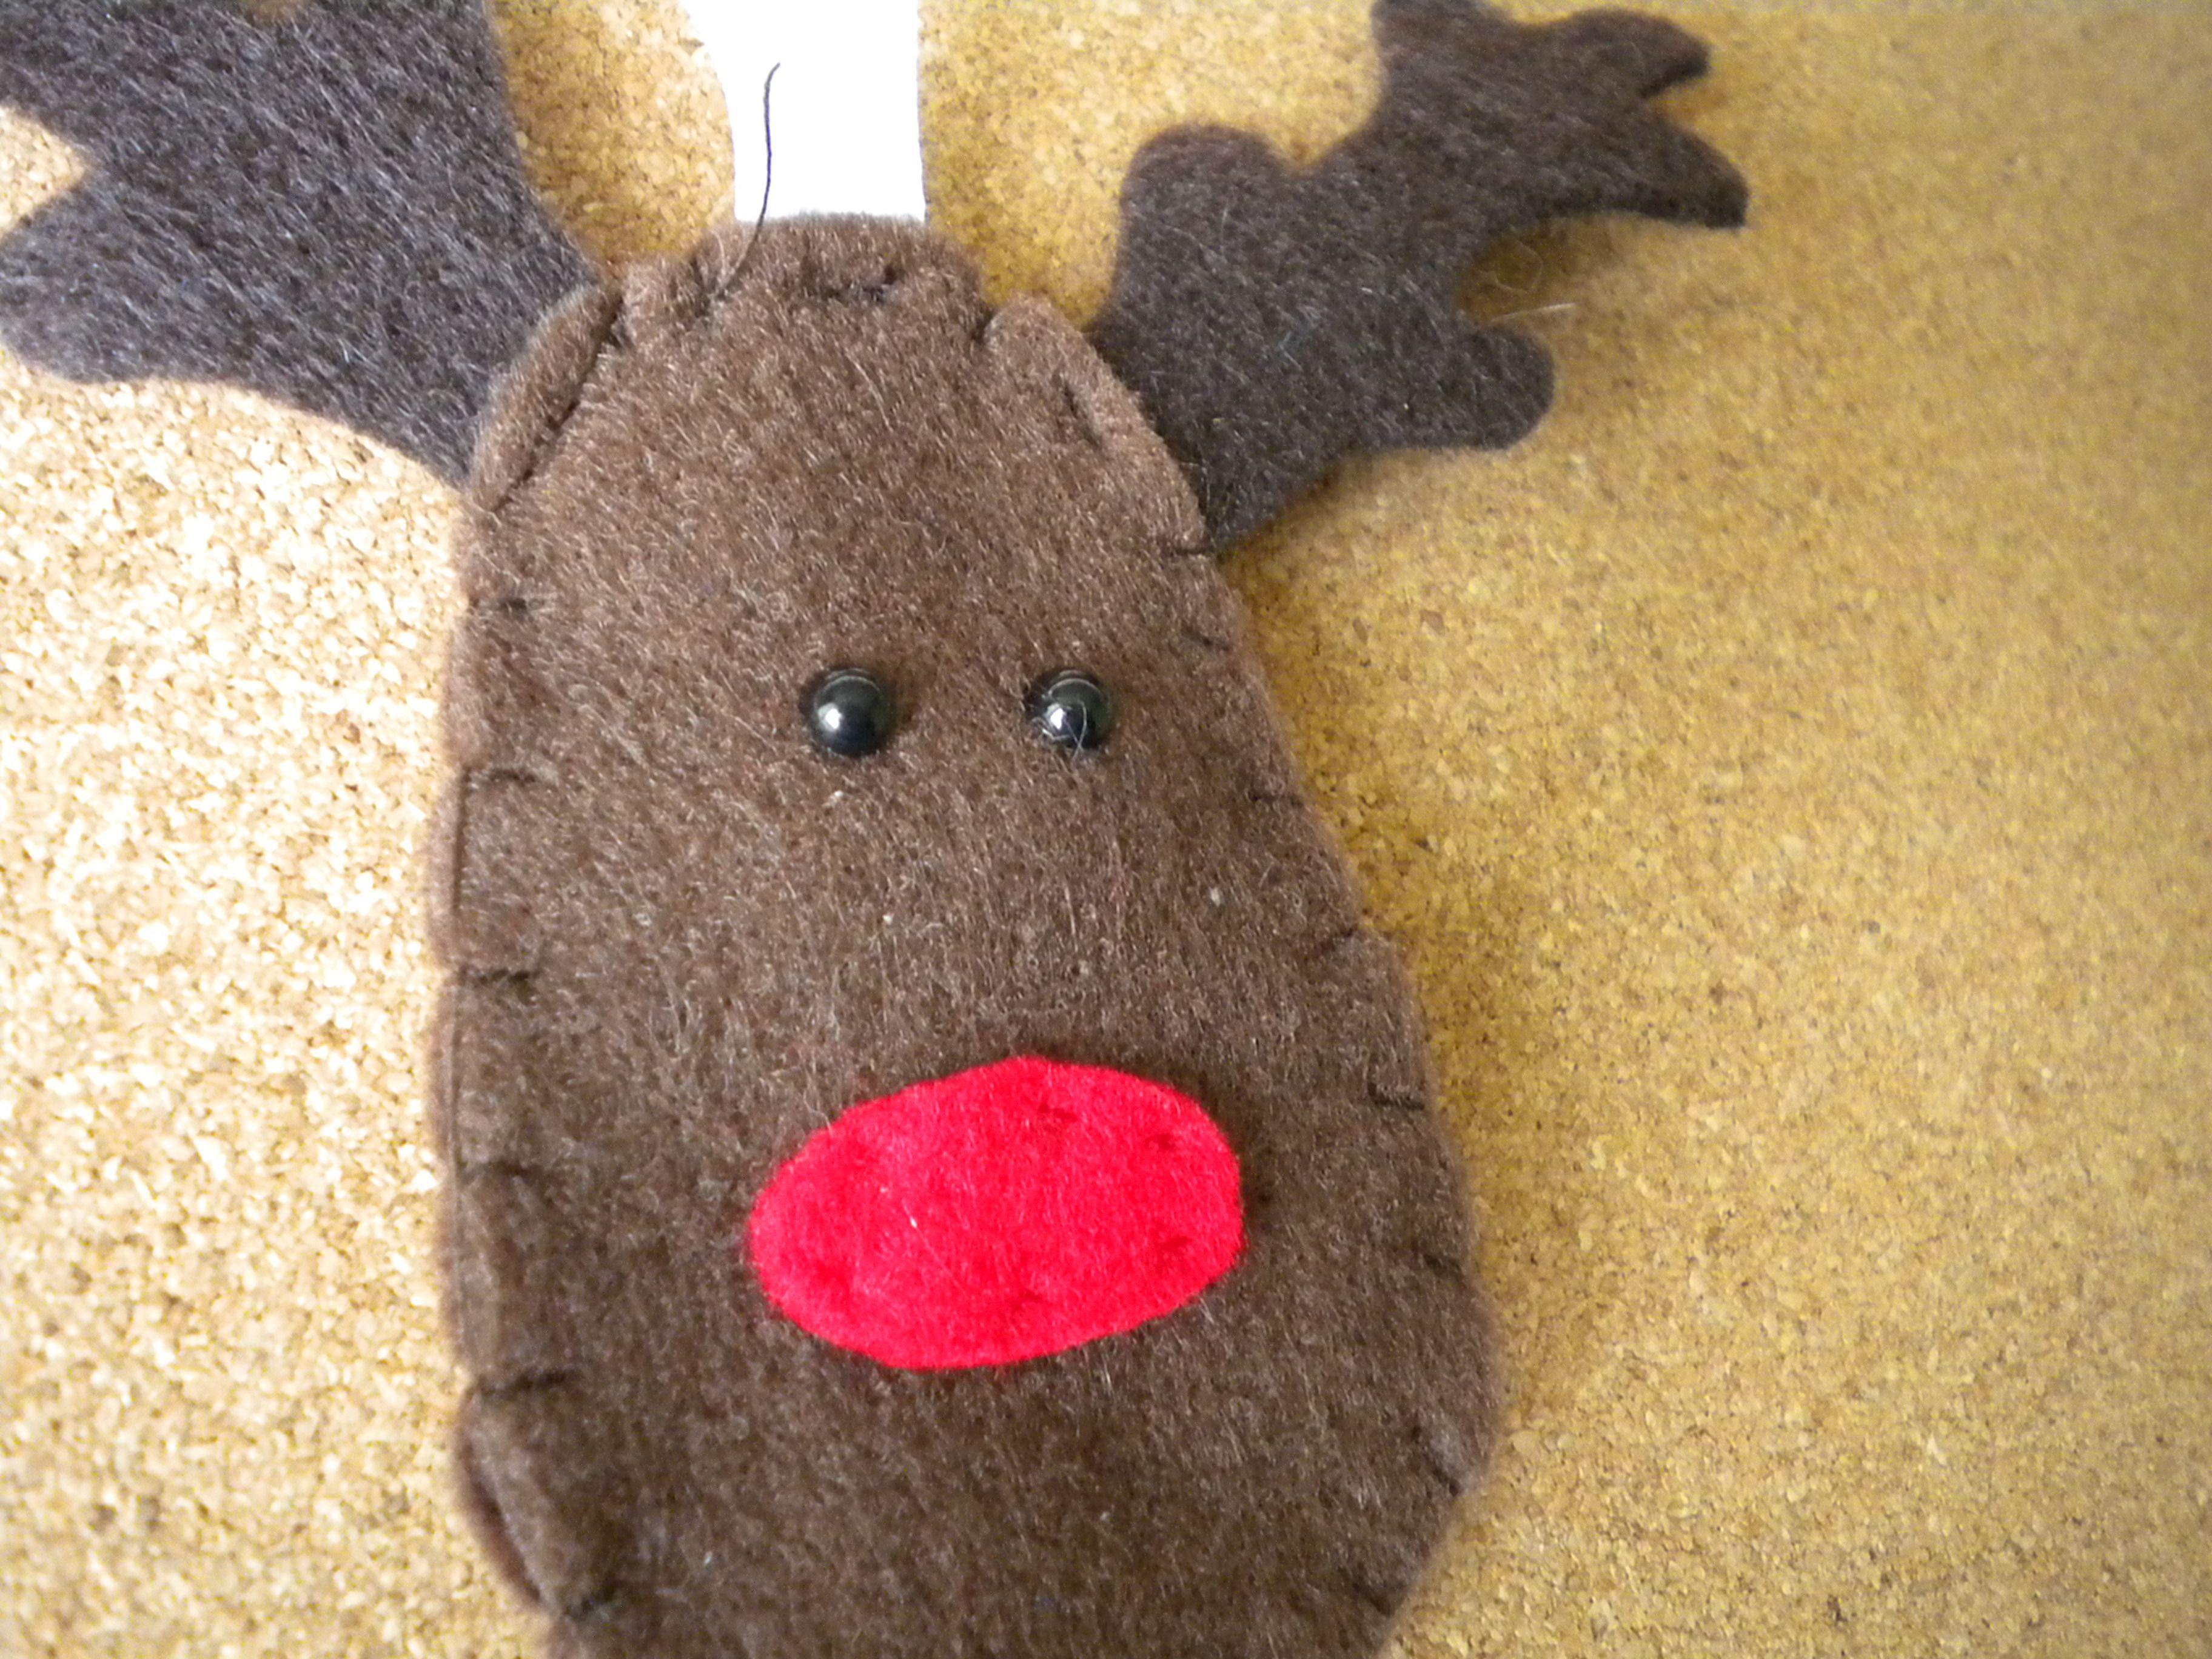 Cute felt reindeer ornament! I love the holidays :)  http://www.etsy.com/listing/112108555/cute-reindeer-hand-sewn-felt-holiday